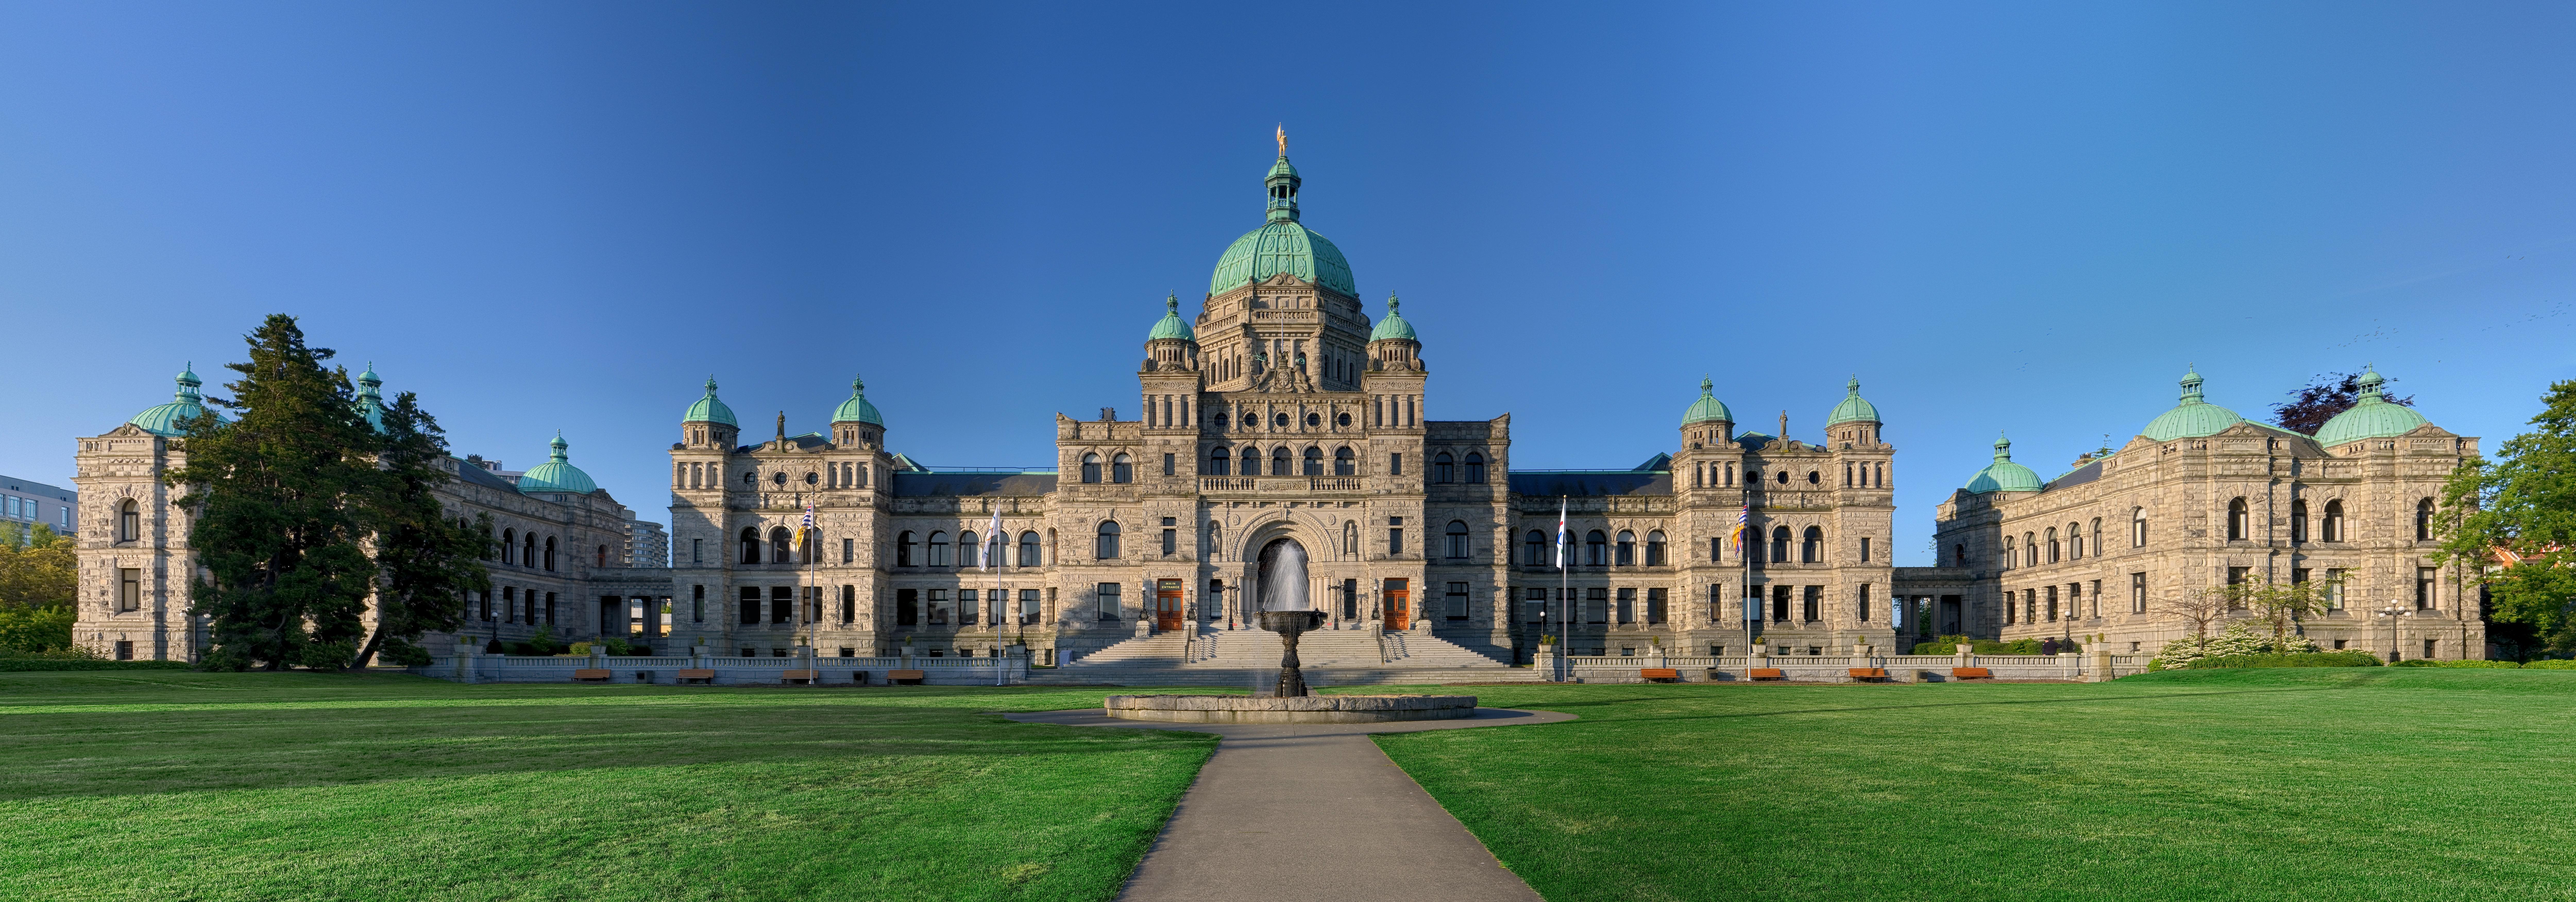 British Columbia Parliament Buildings Pano Hdr